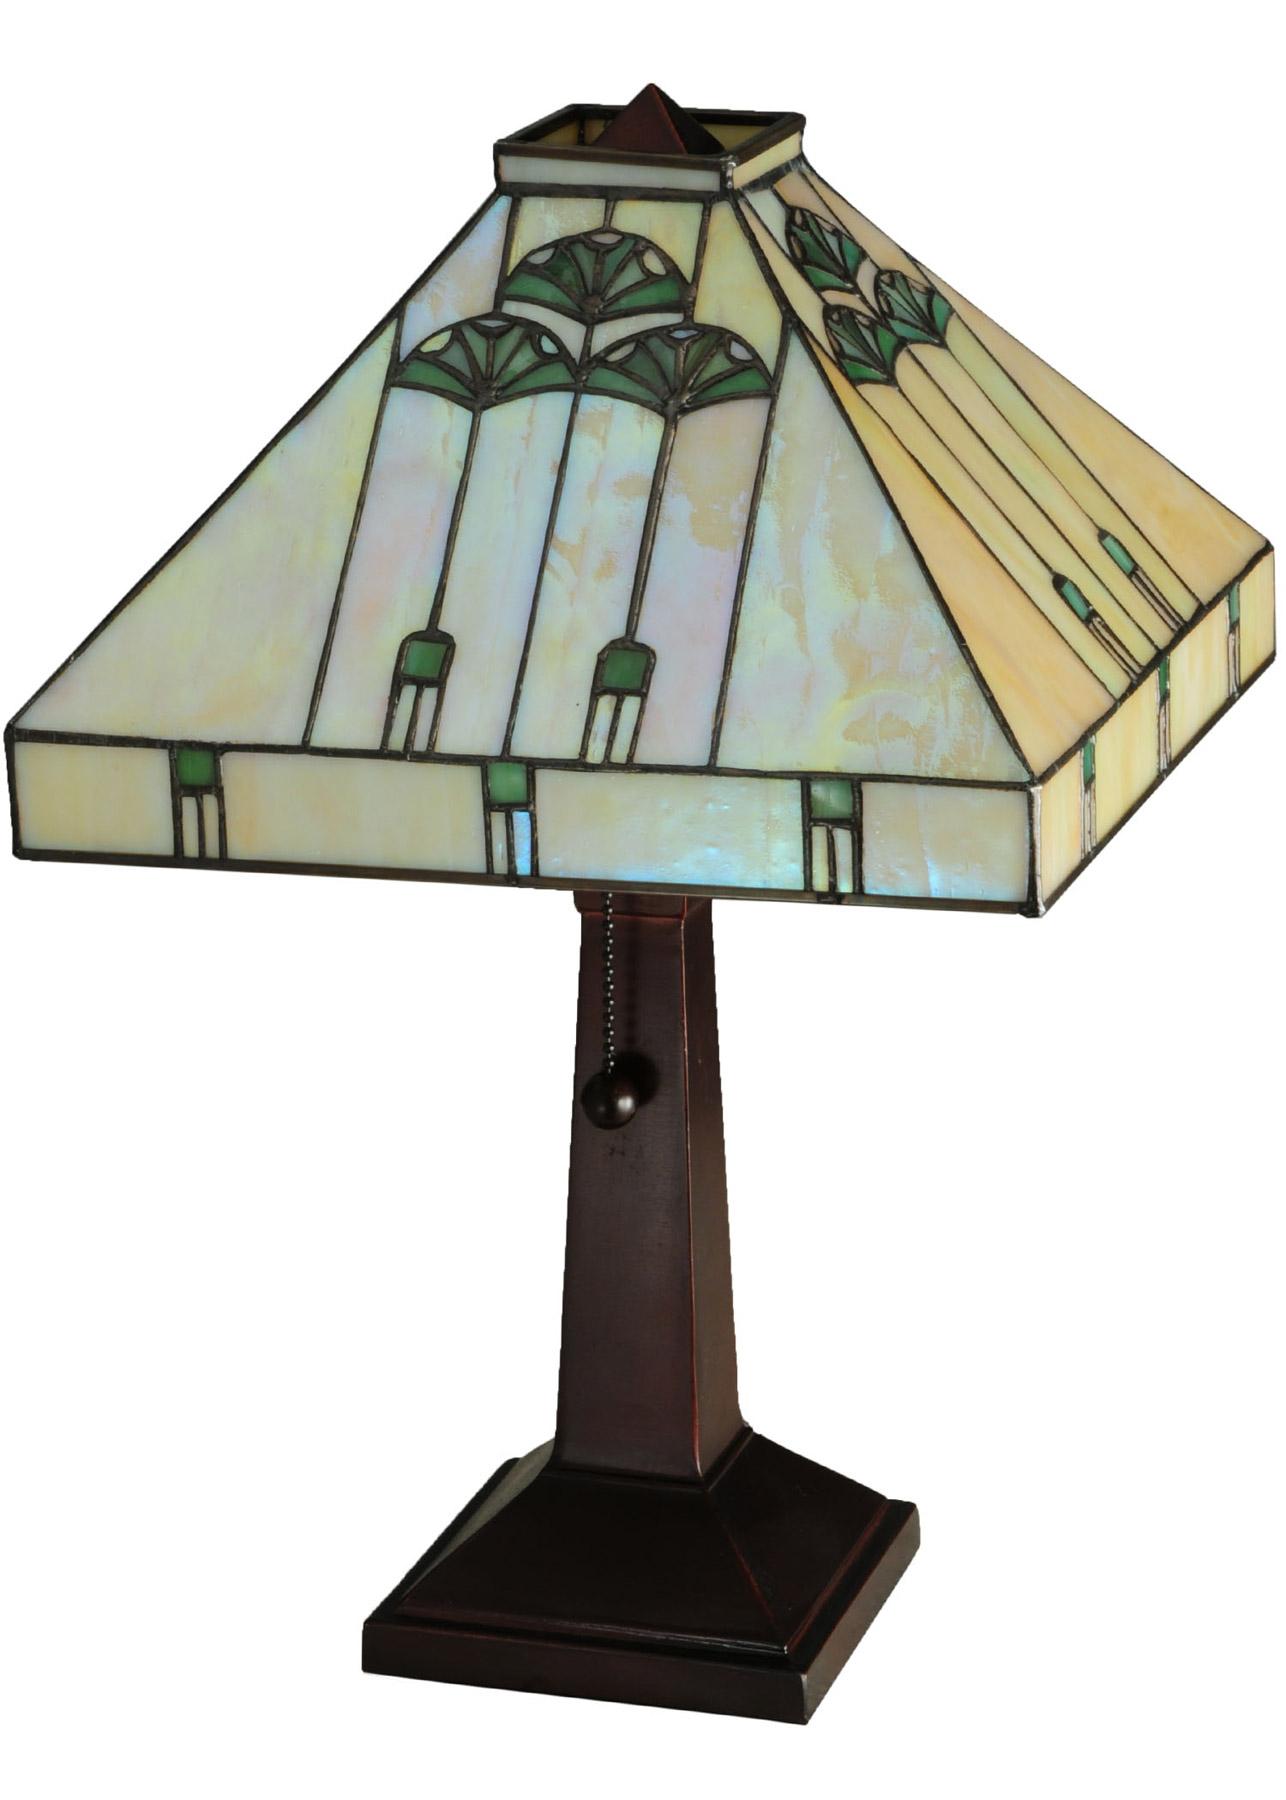 Meyda 141462 ginkgo table lamp alternate image 1 alternate image 2 aloadofball Gallery